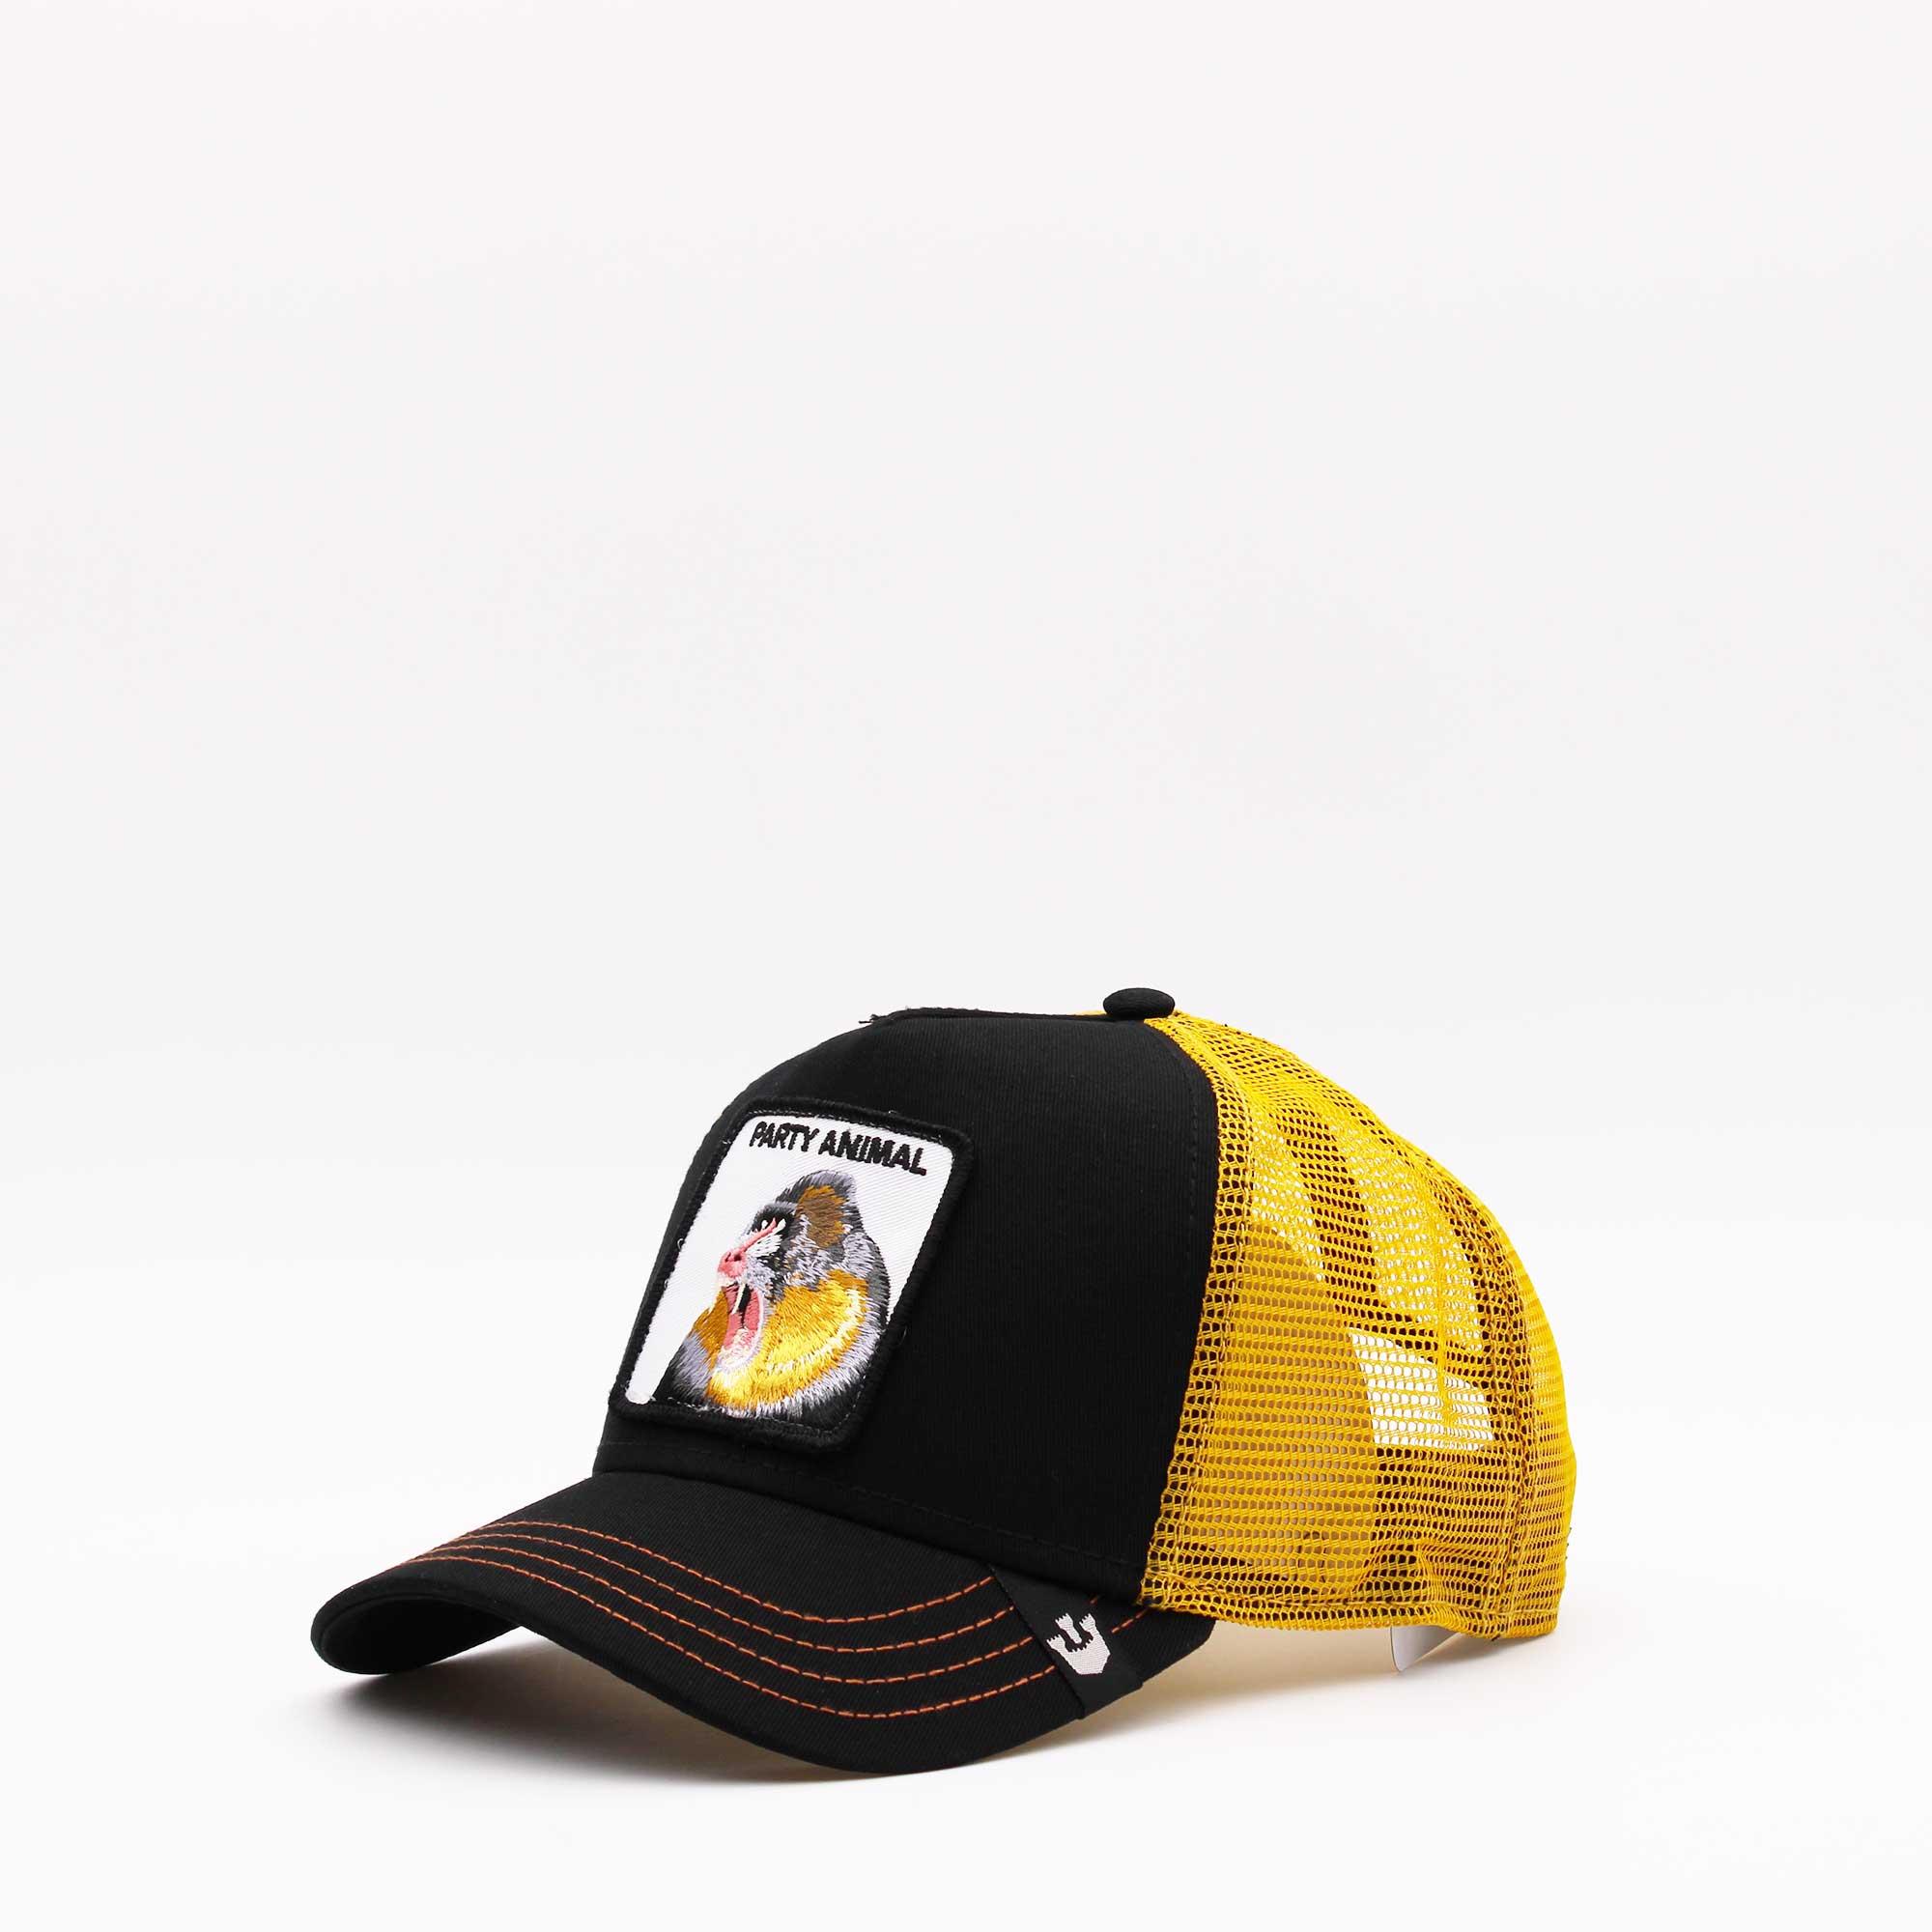 Cappello baseball party animal - Nero